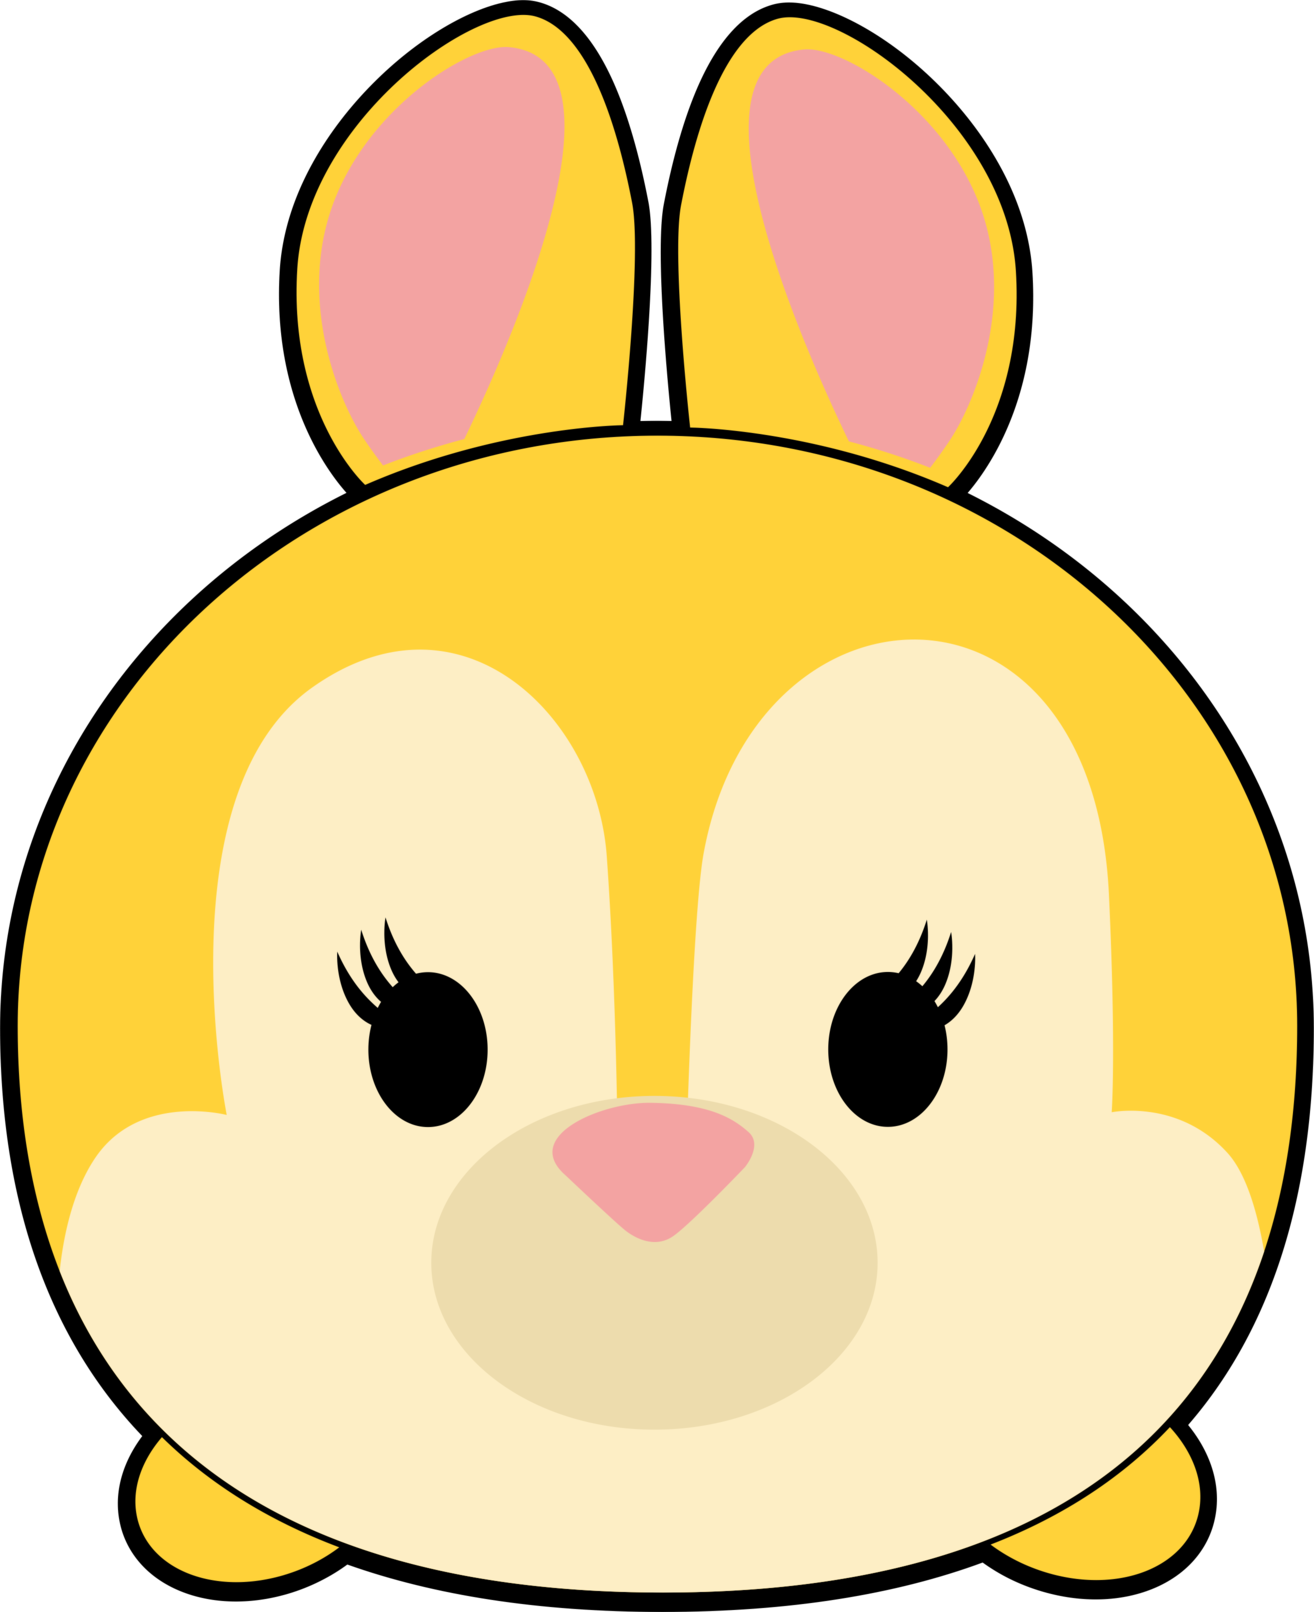 Disney Tsum Tsum Clipart 30